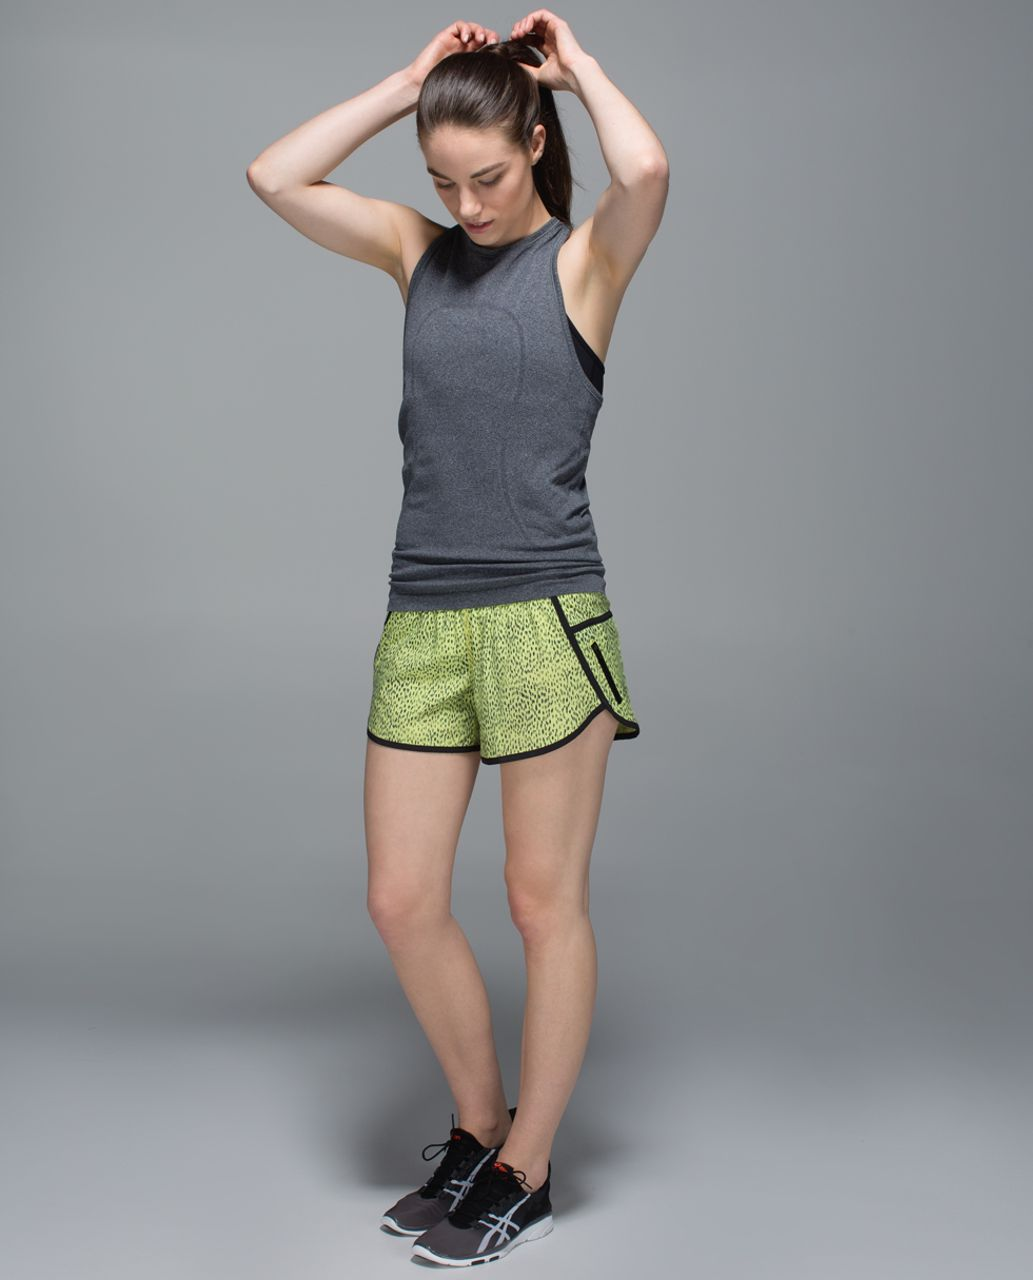 Lululemon Tracker Short III *4-way Stretch - Dottie Dash Clarity Yellow Black / Black